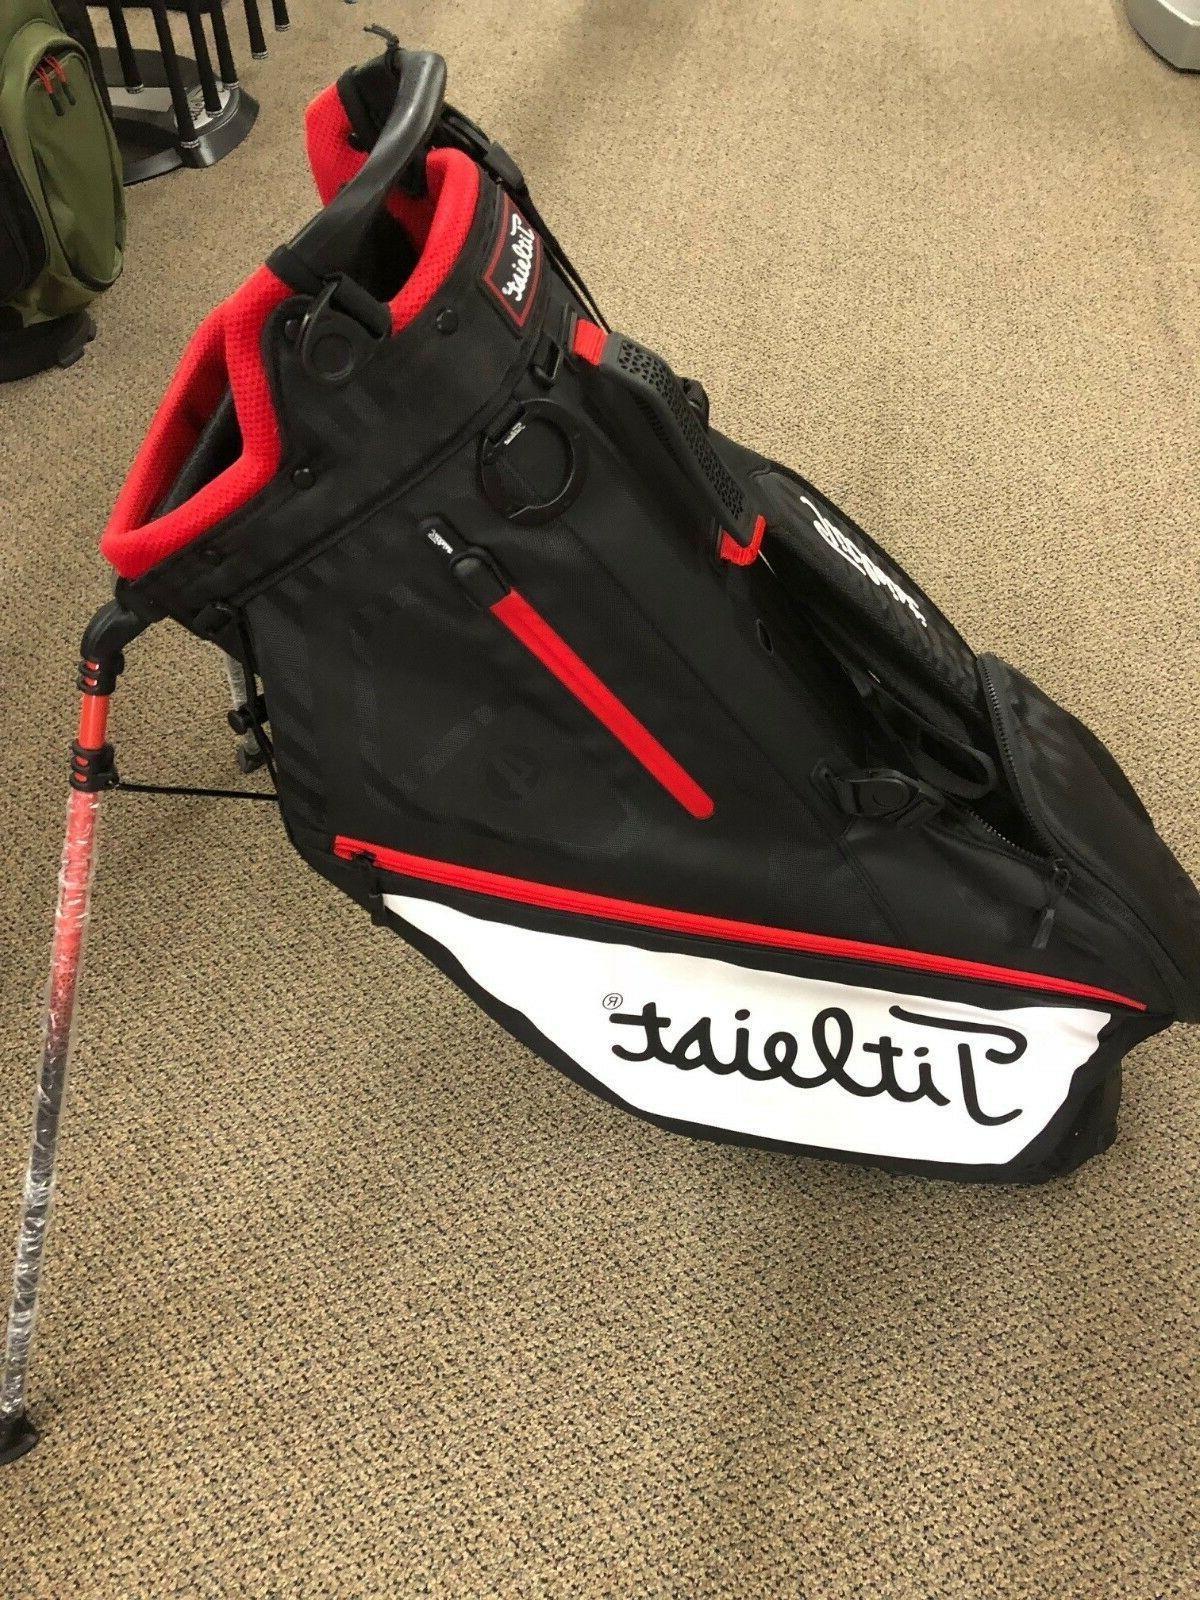 15742984cf Titleist Players 4 Stand Bag-TB7SX1-Titleist Golf Stand Bag-FREE